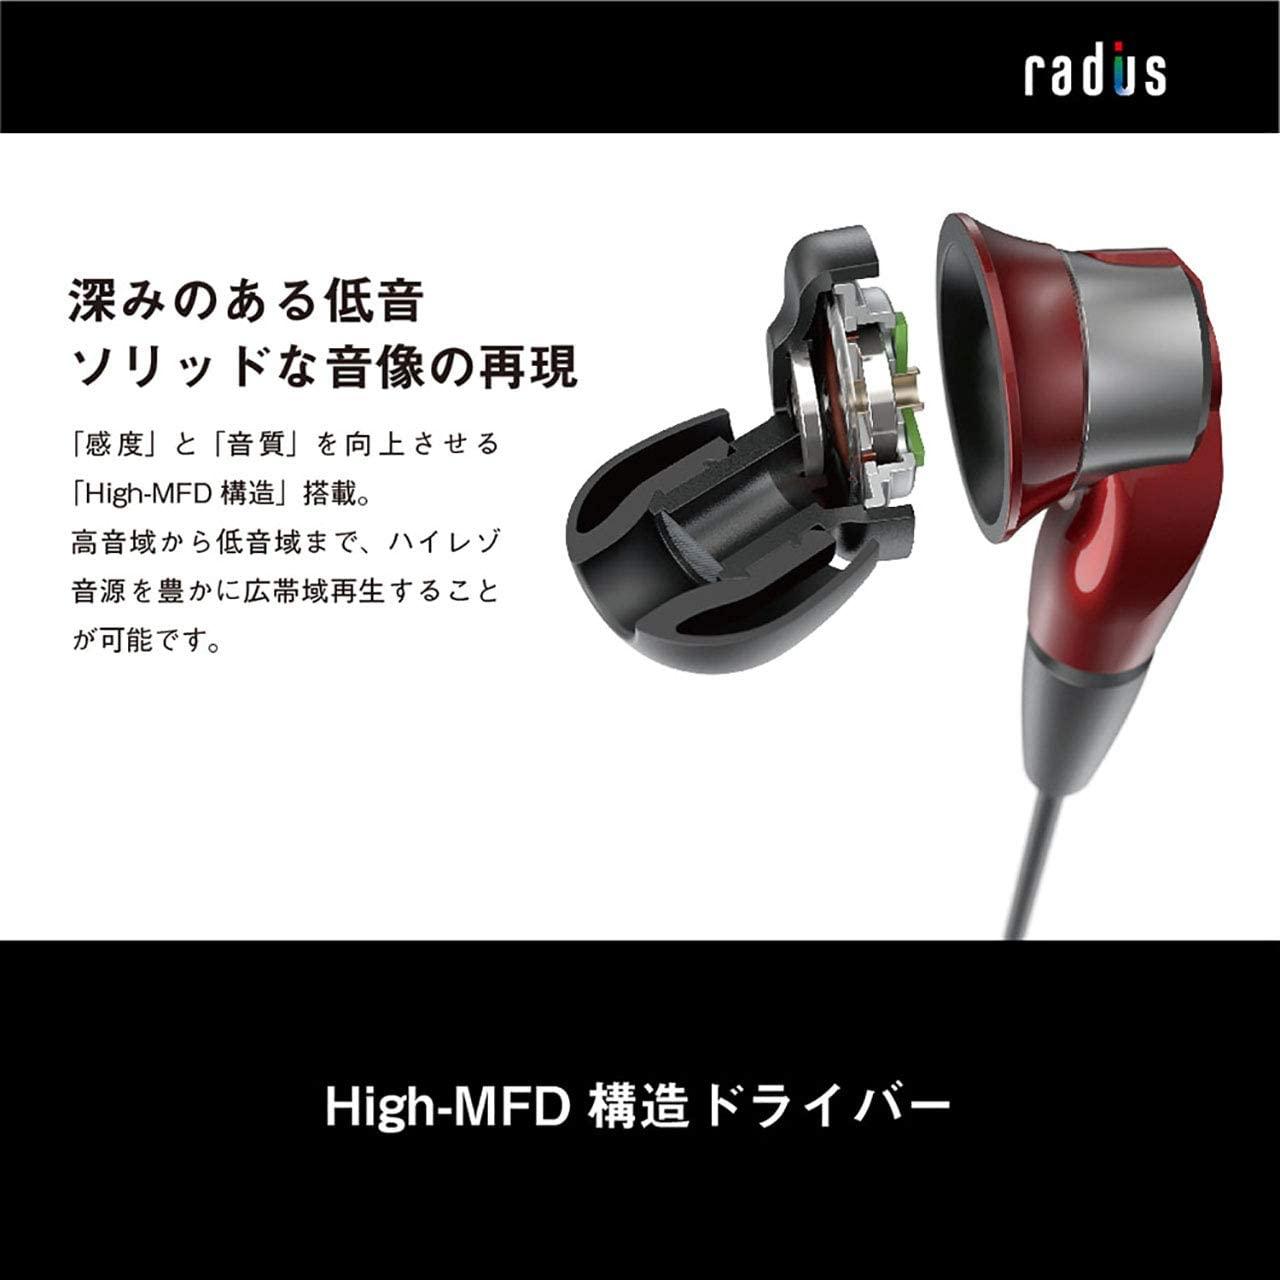 HP-NHR31 High-MFD搭載 重低音ハイレゾイヤホン MMCXコネクタ搭載